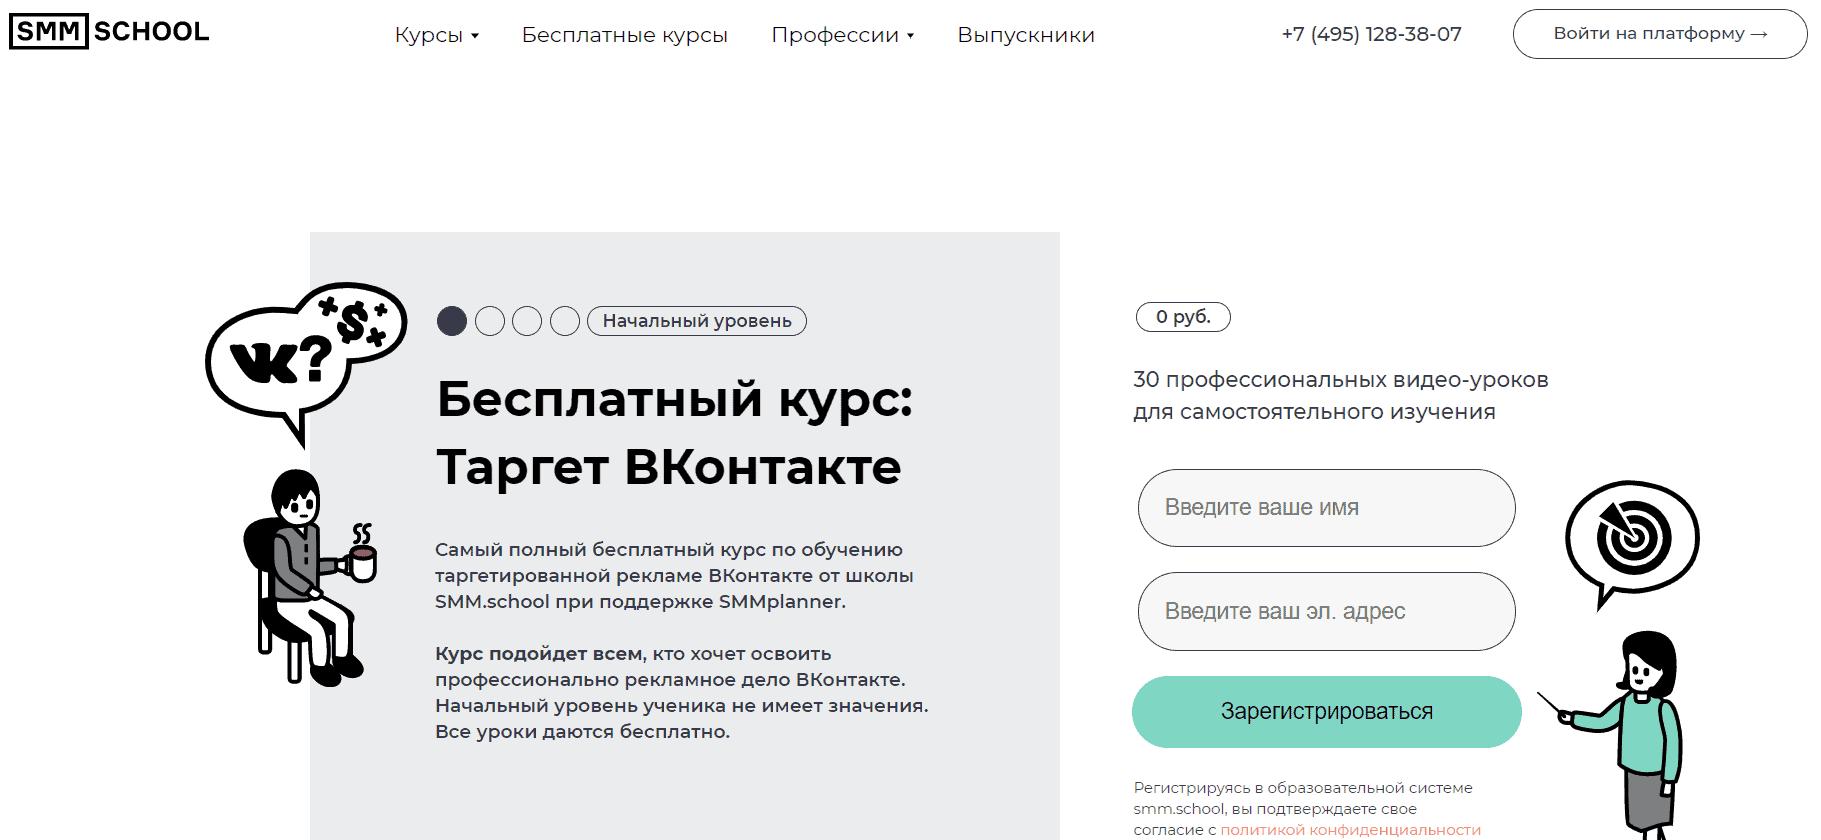 Таргет Вконтакте от SMM.School